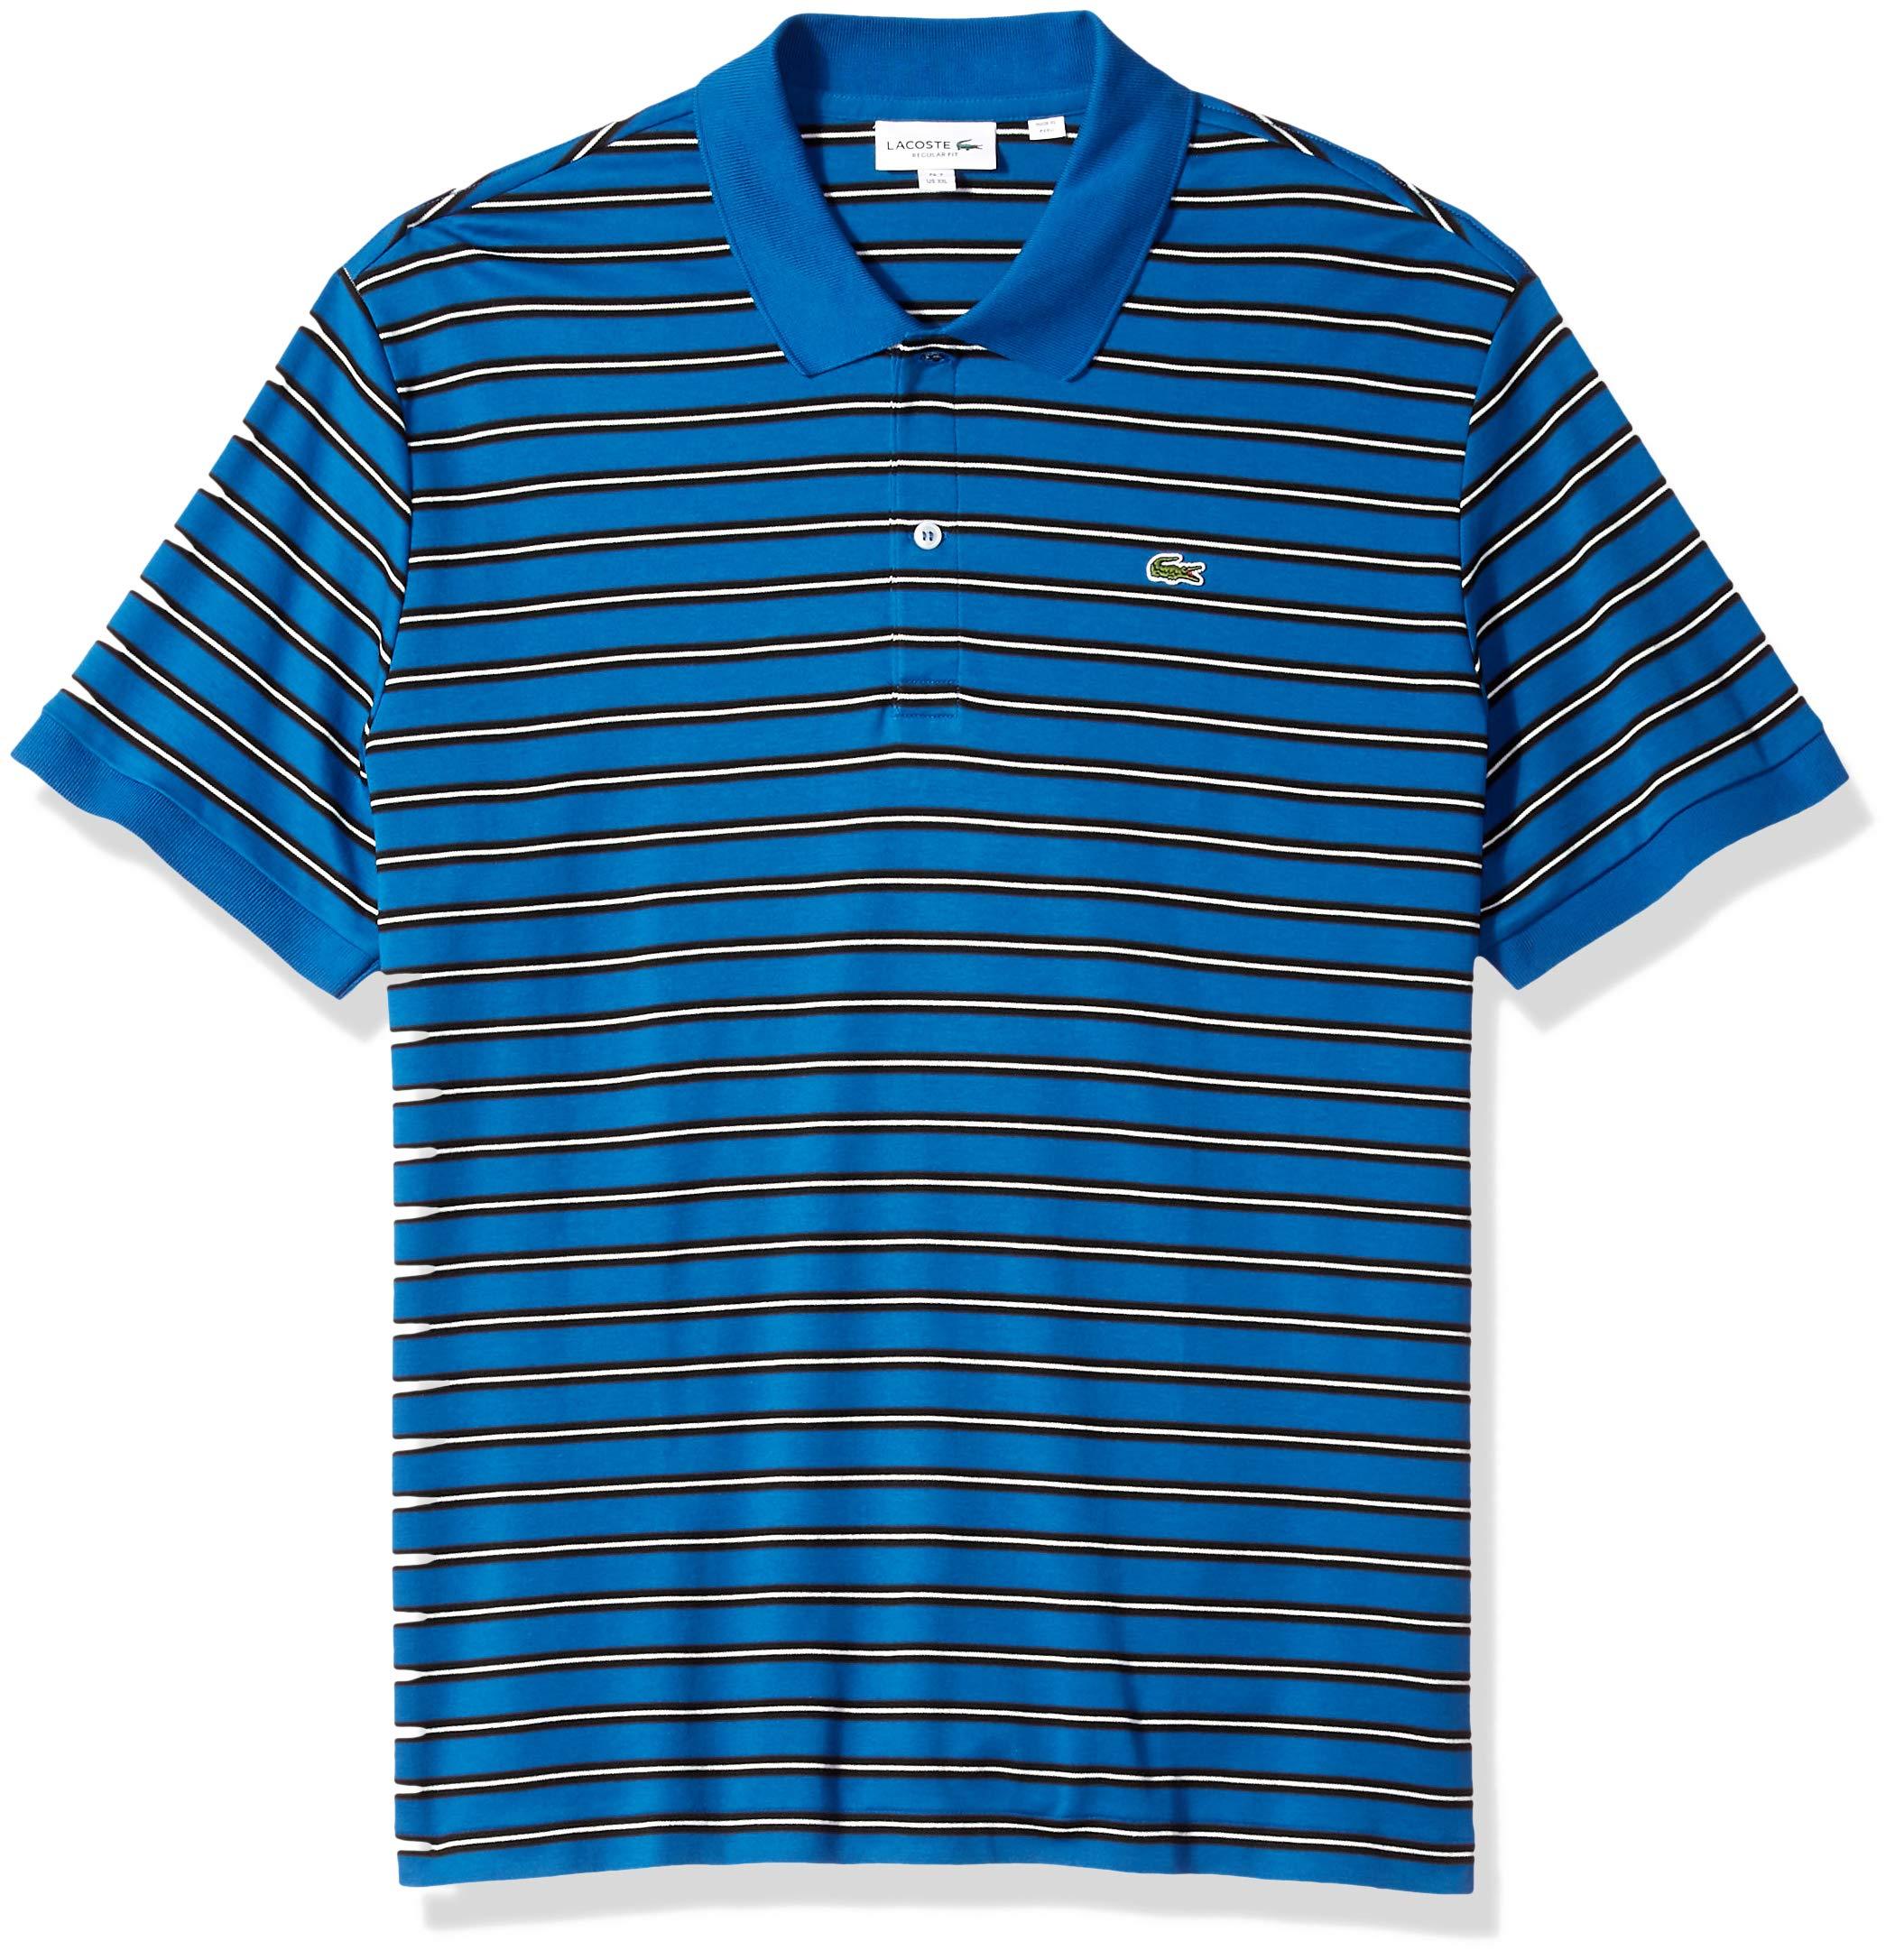 Lacoste Men's Short Sleeve Pima Reg Fit Fine Stripe Polo, Electric/Meridian Blue/Blue, Medium